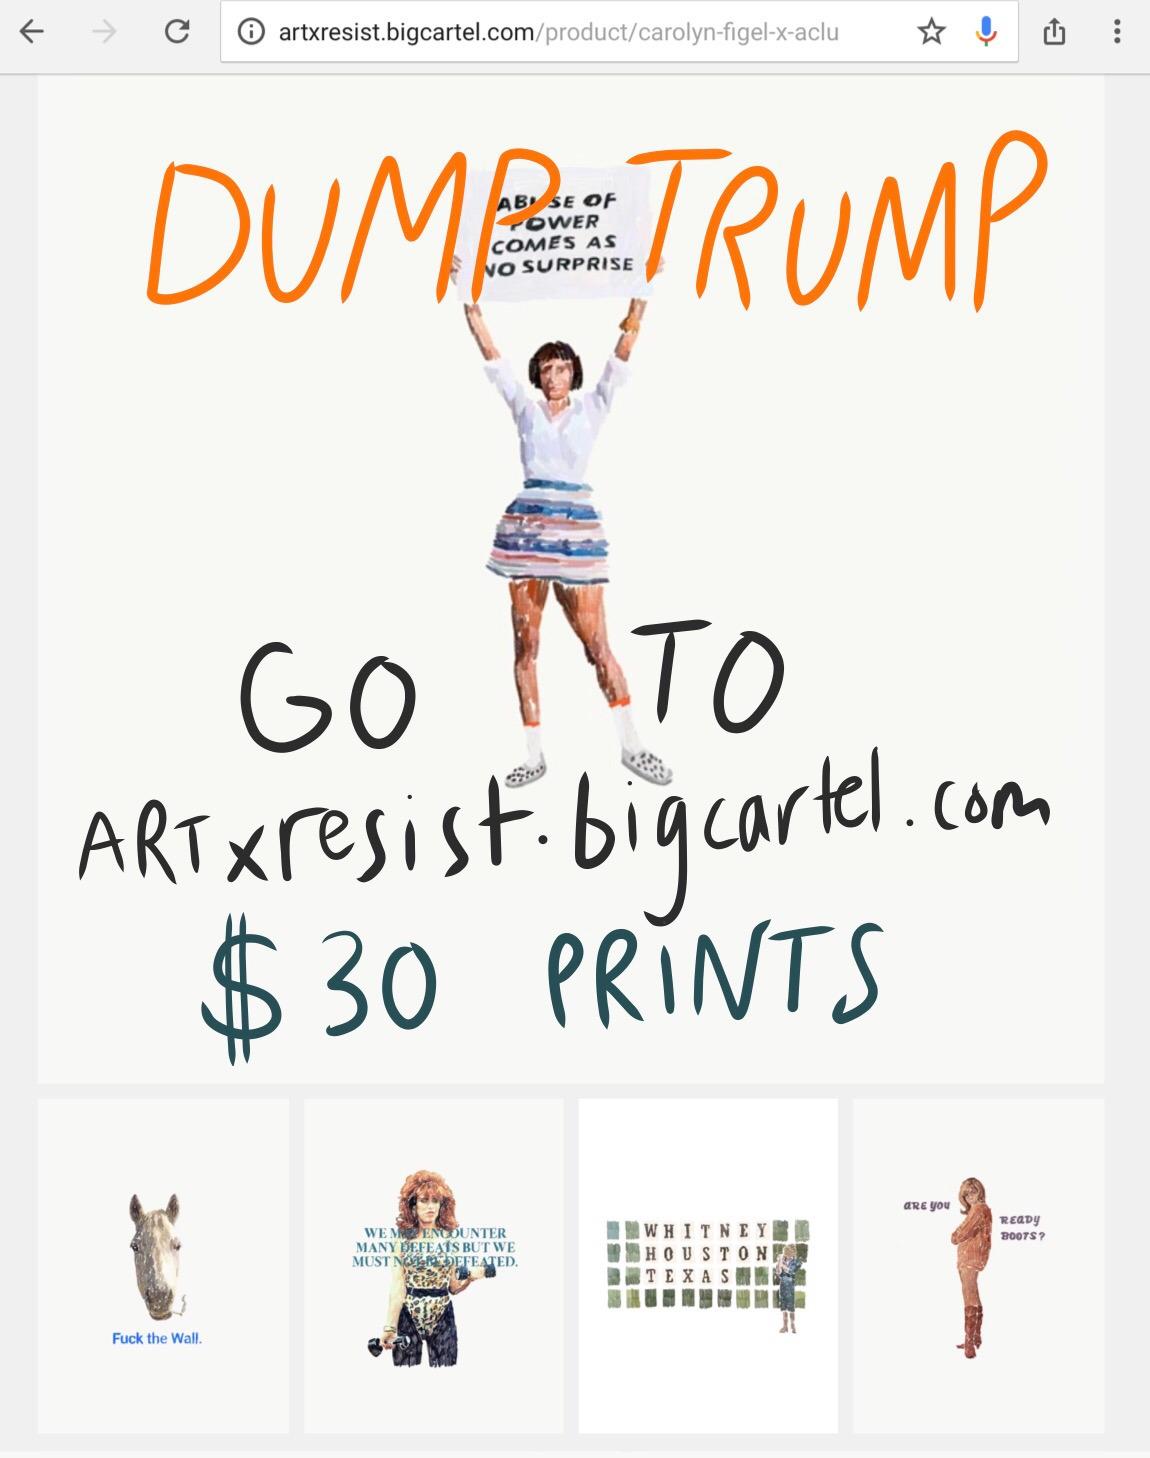 Buy print support good $30 notm - carolynfigel   ello